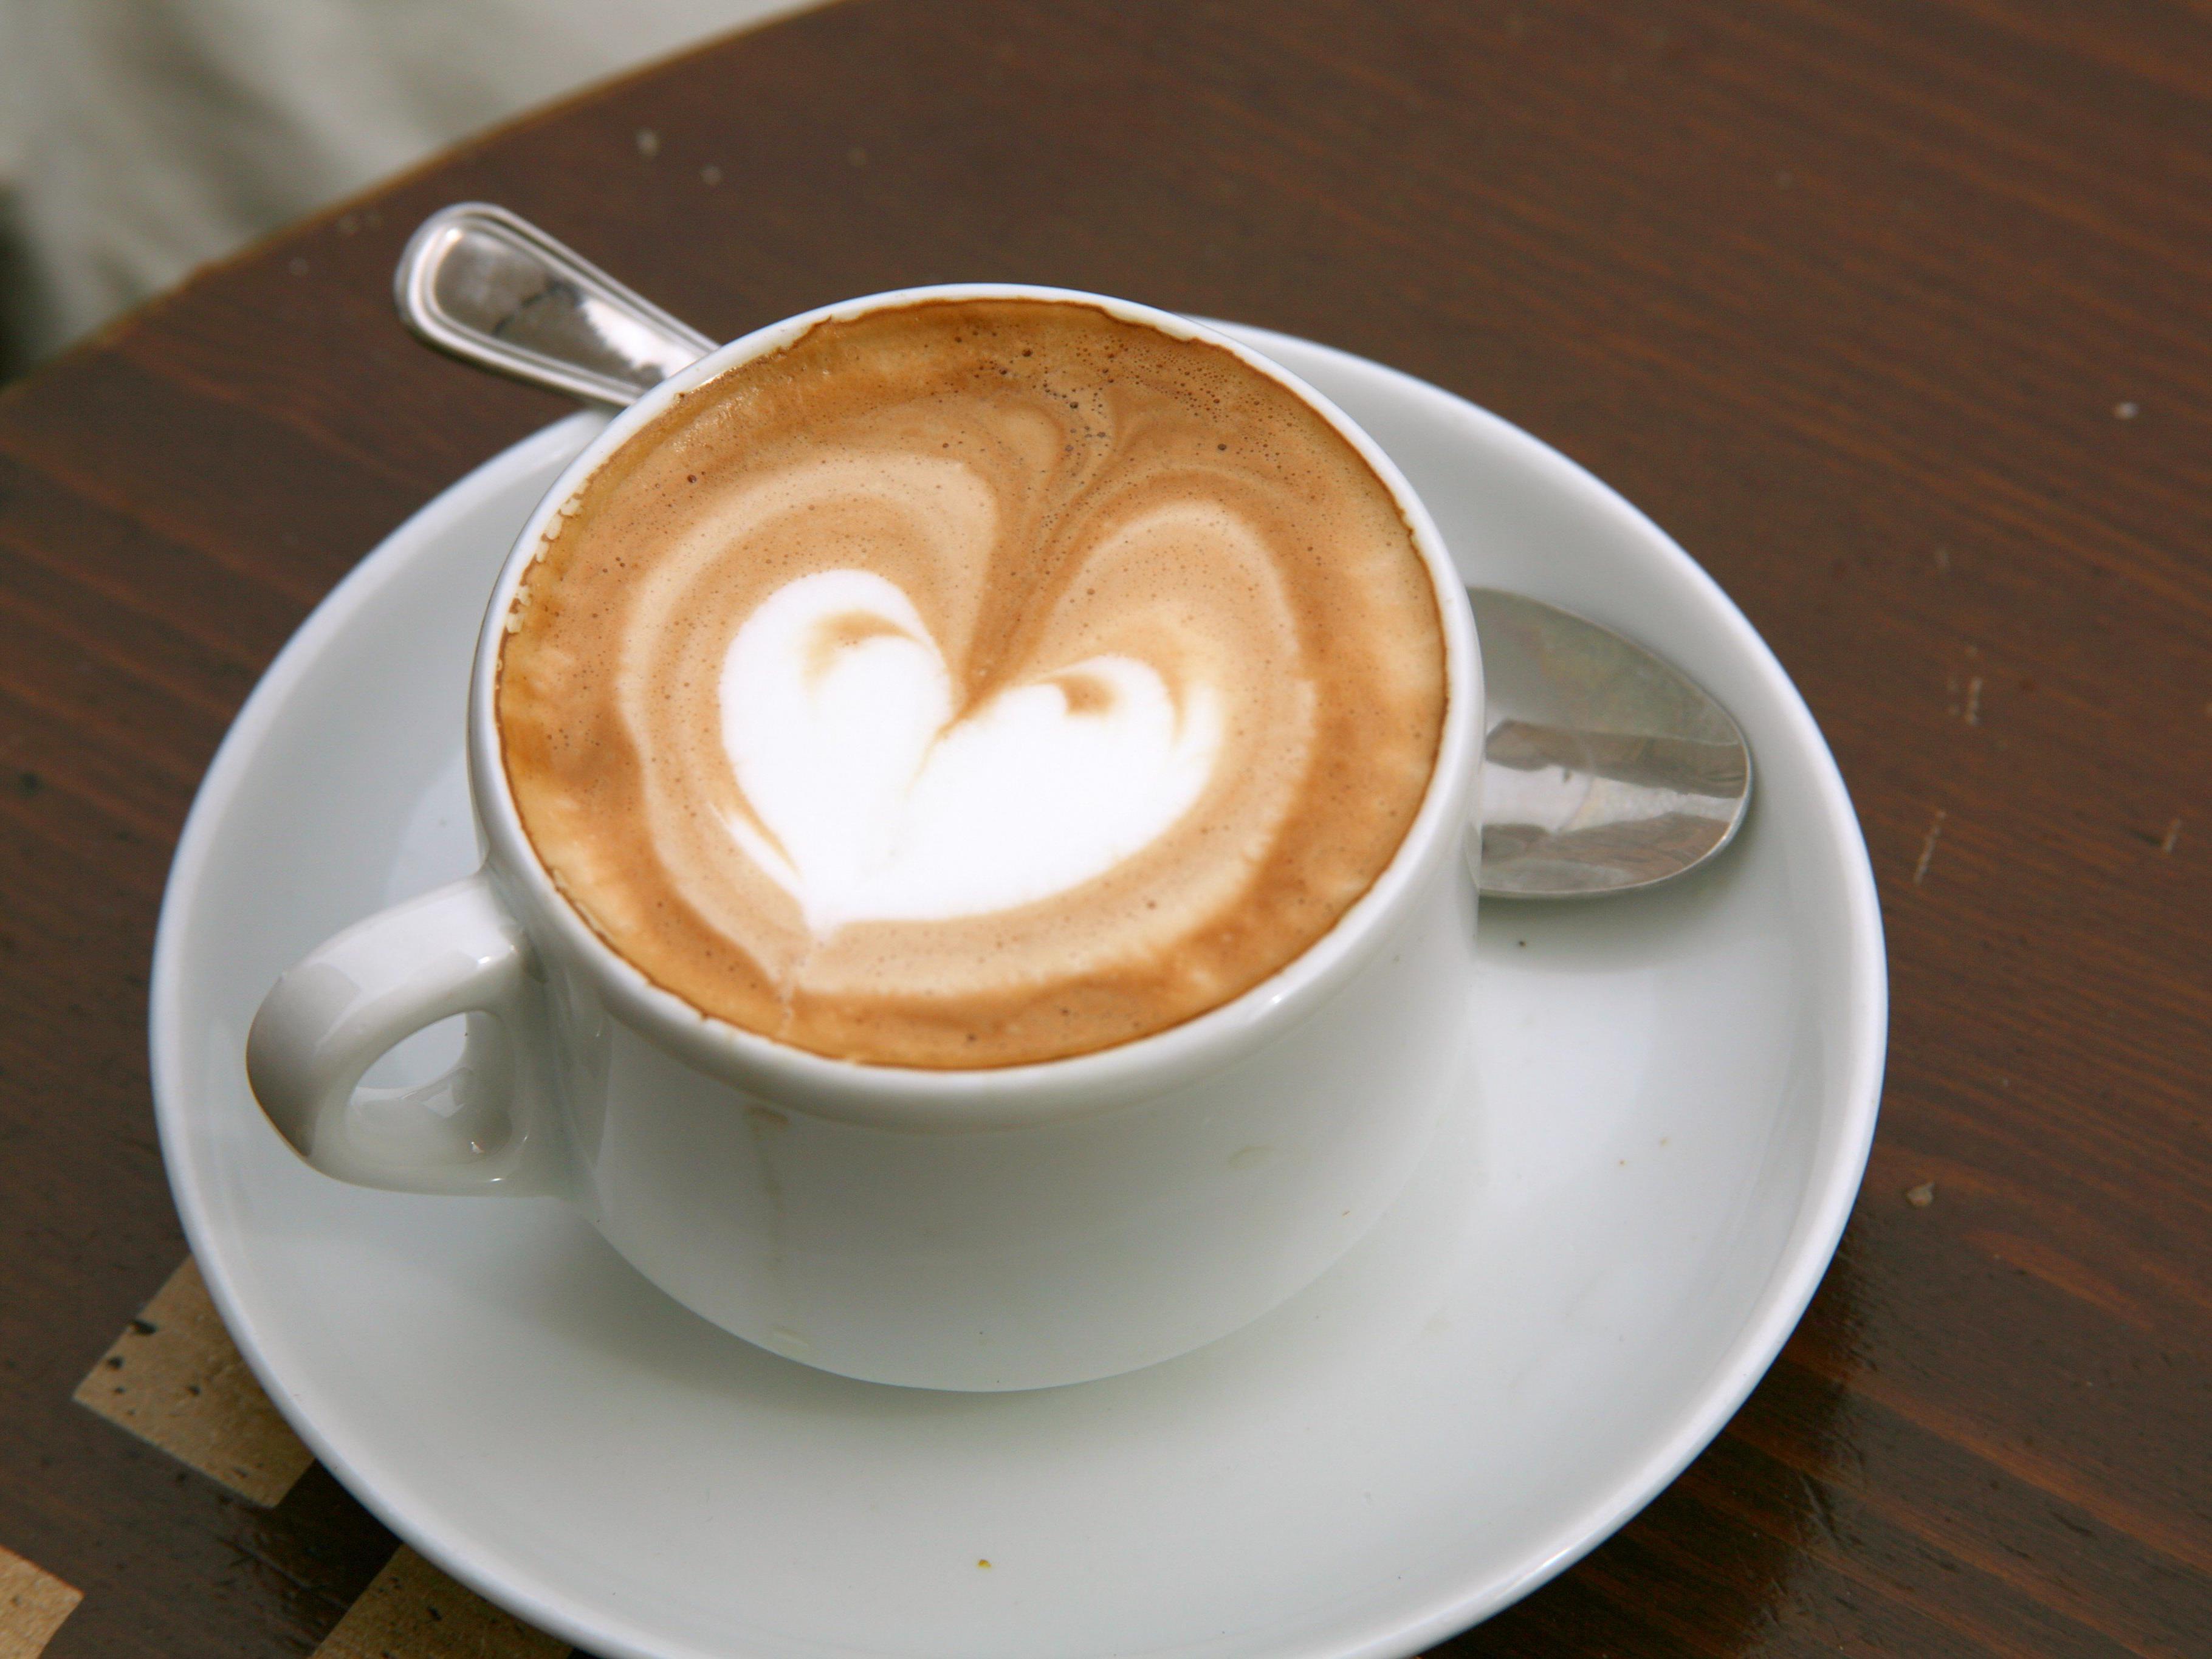 Höflich bestellen bedeutet günsitgeren Kaffee.